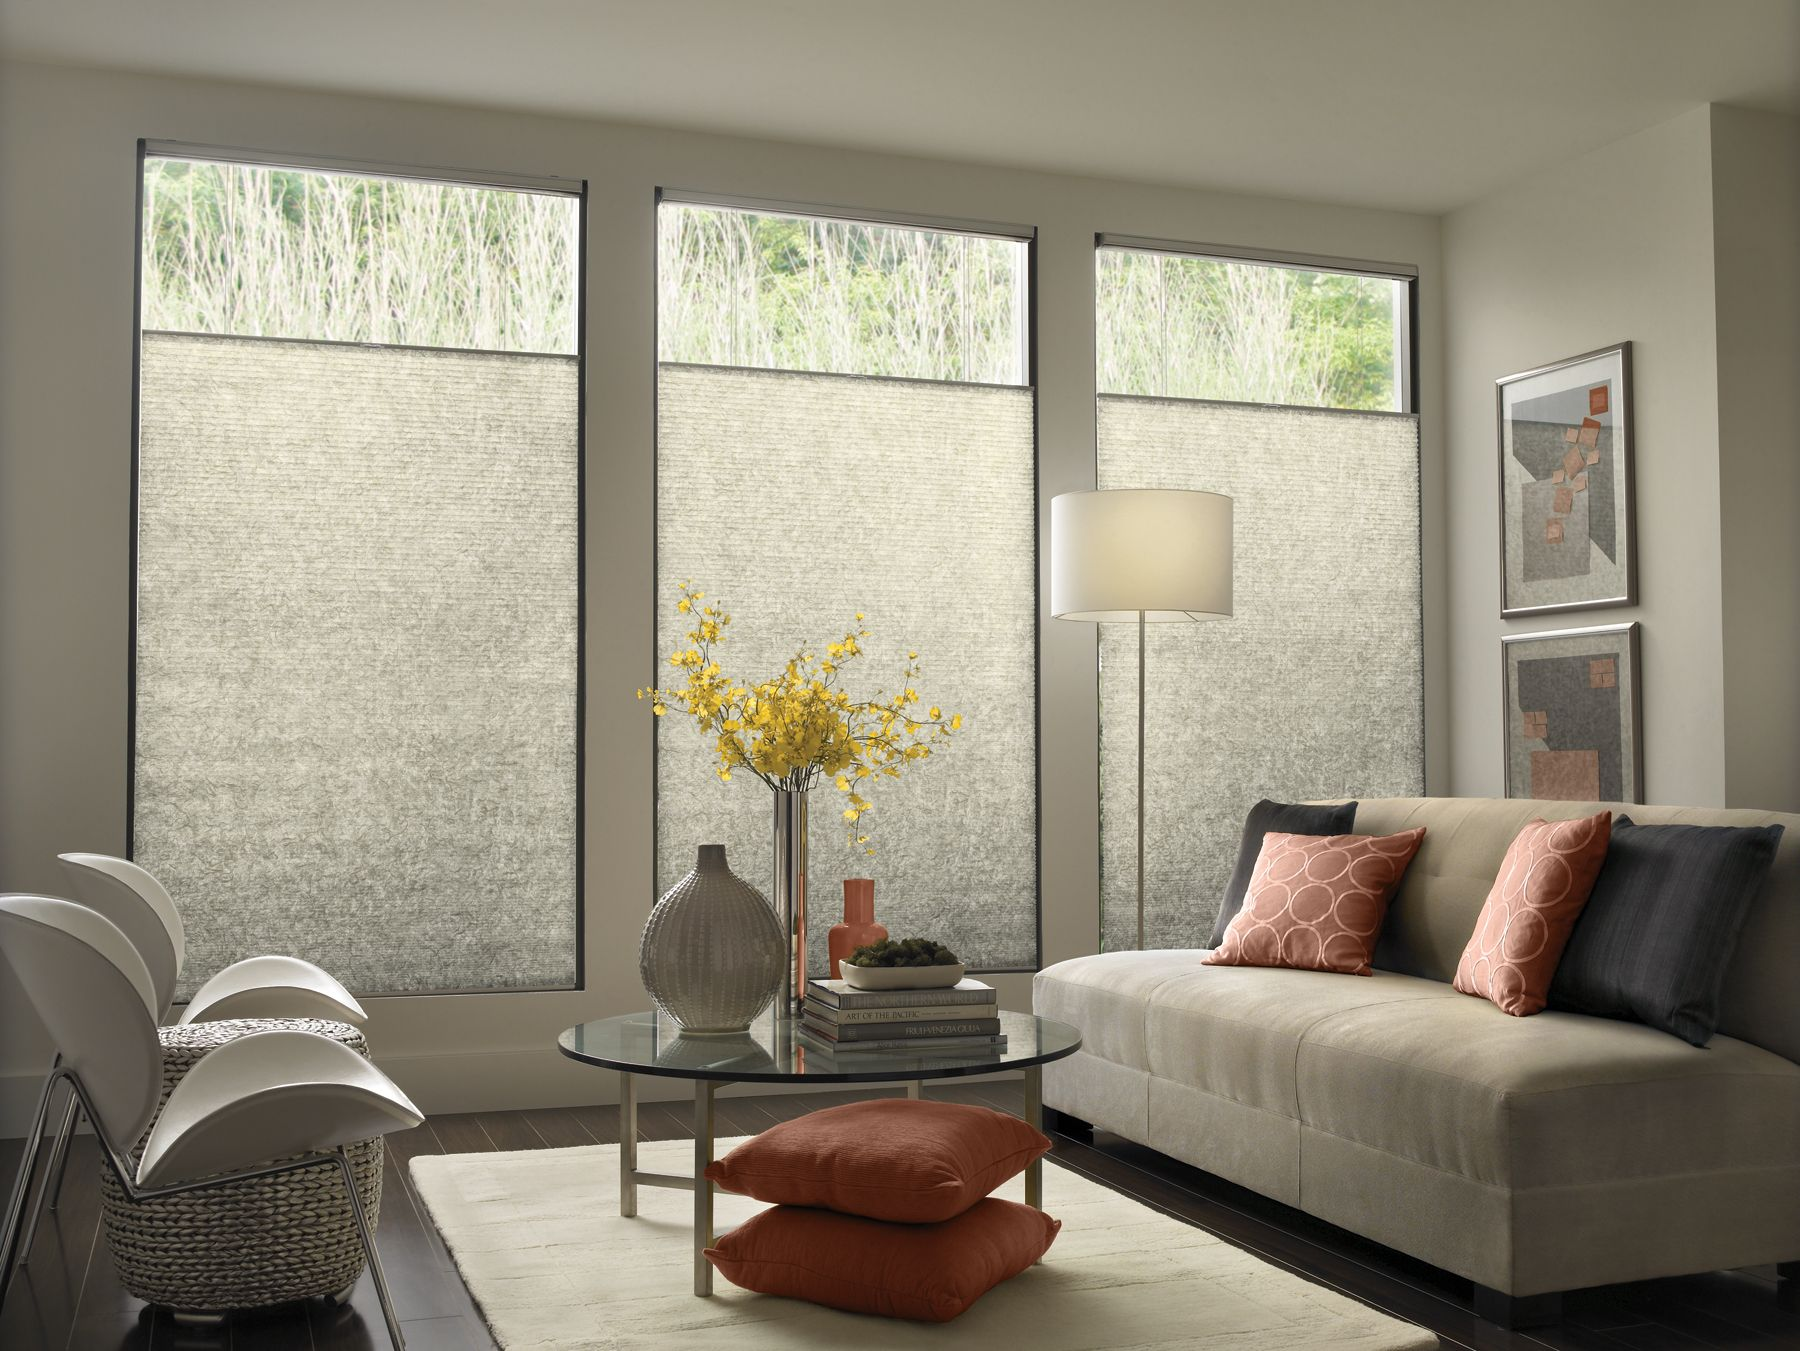 modern window treatments for living room wall art decor introduction and ideas contemporary with mid century sofa vqadbtj